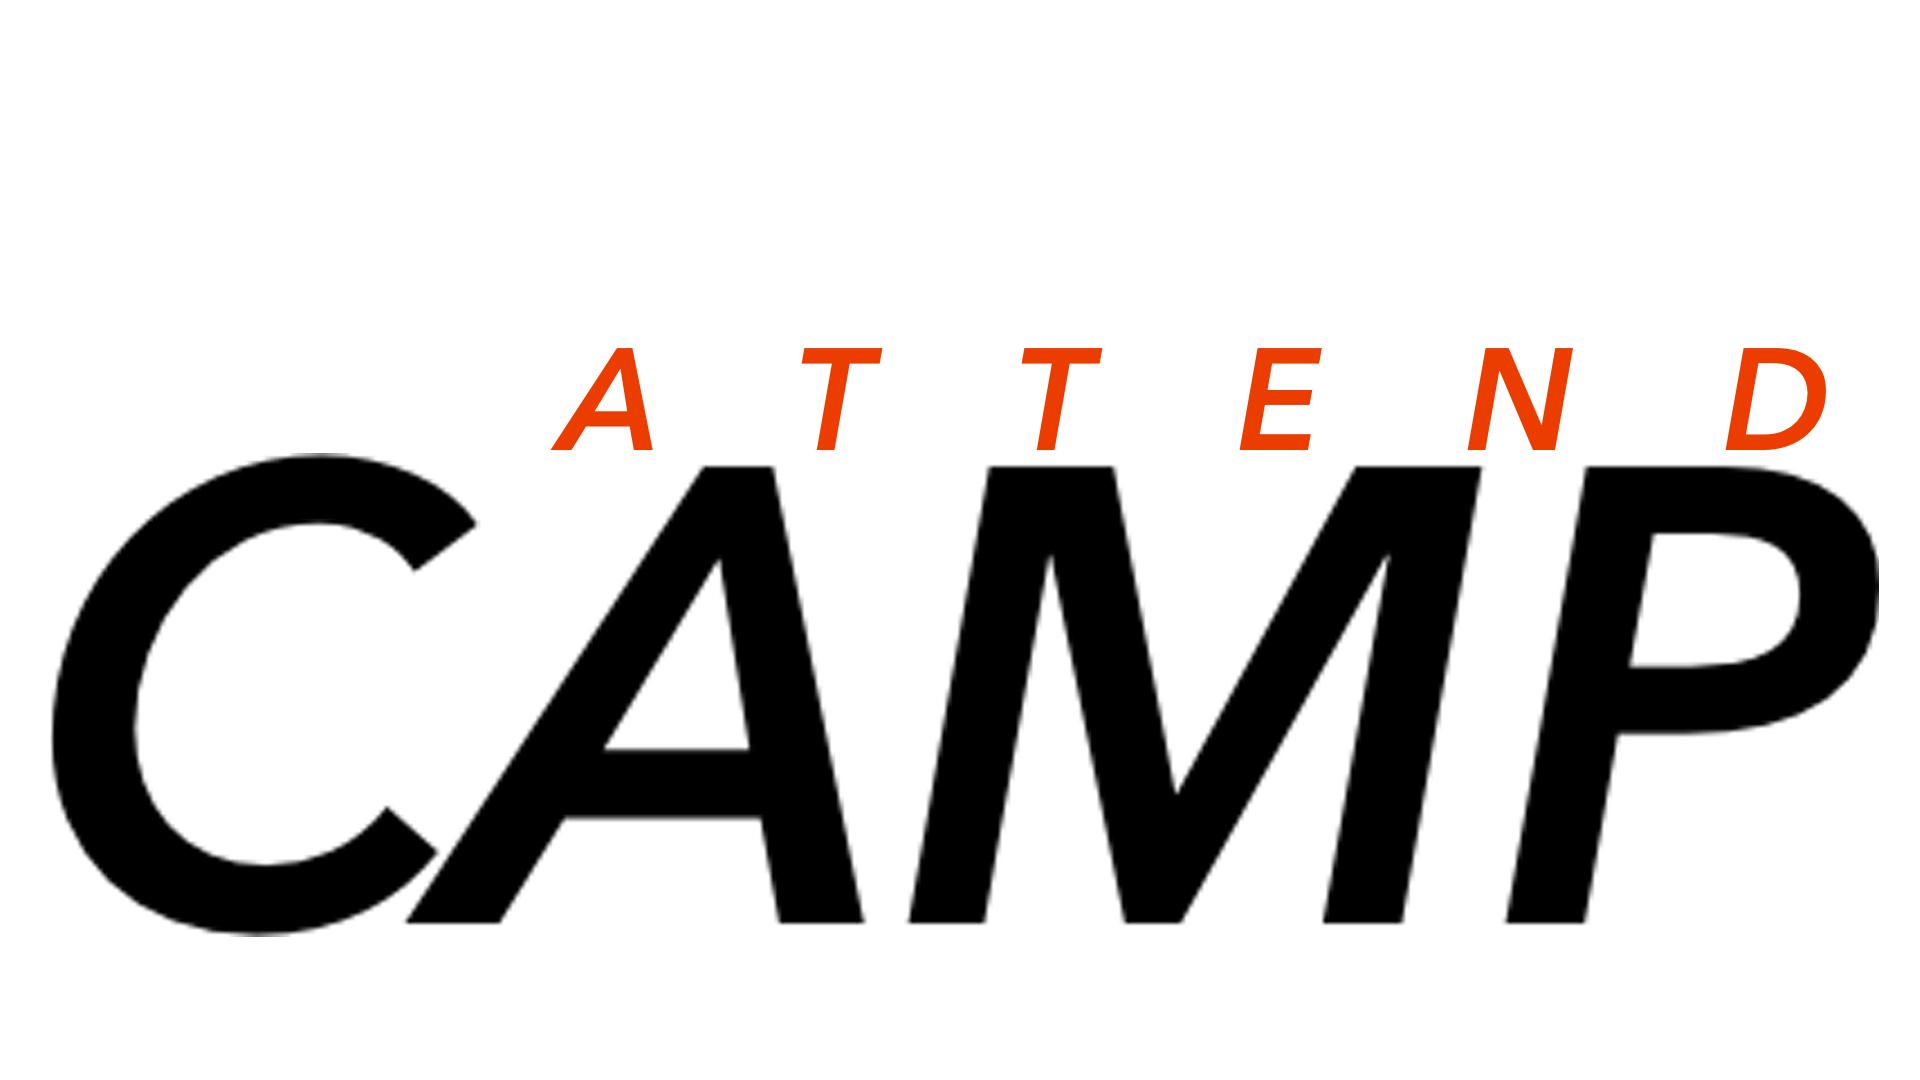 ATTEND CAMP.jpg